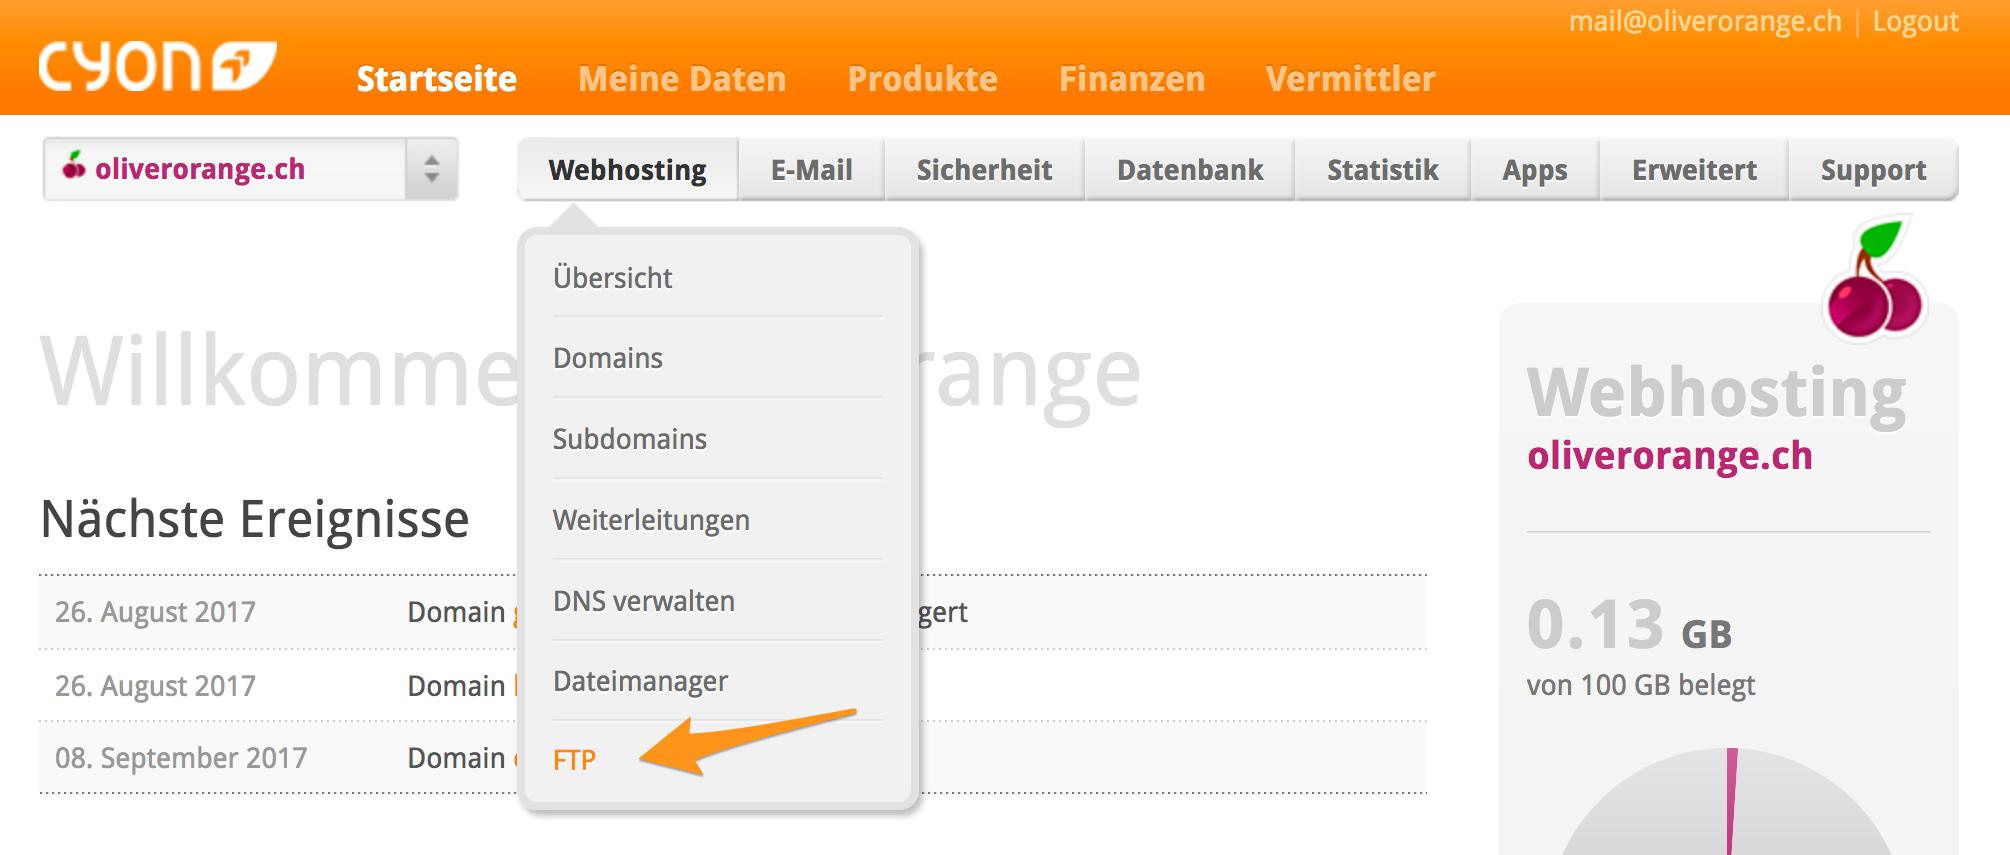 Menü «webhosting»> «FTP» im my.cyon